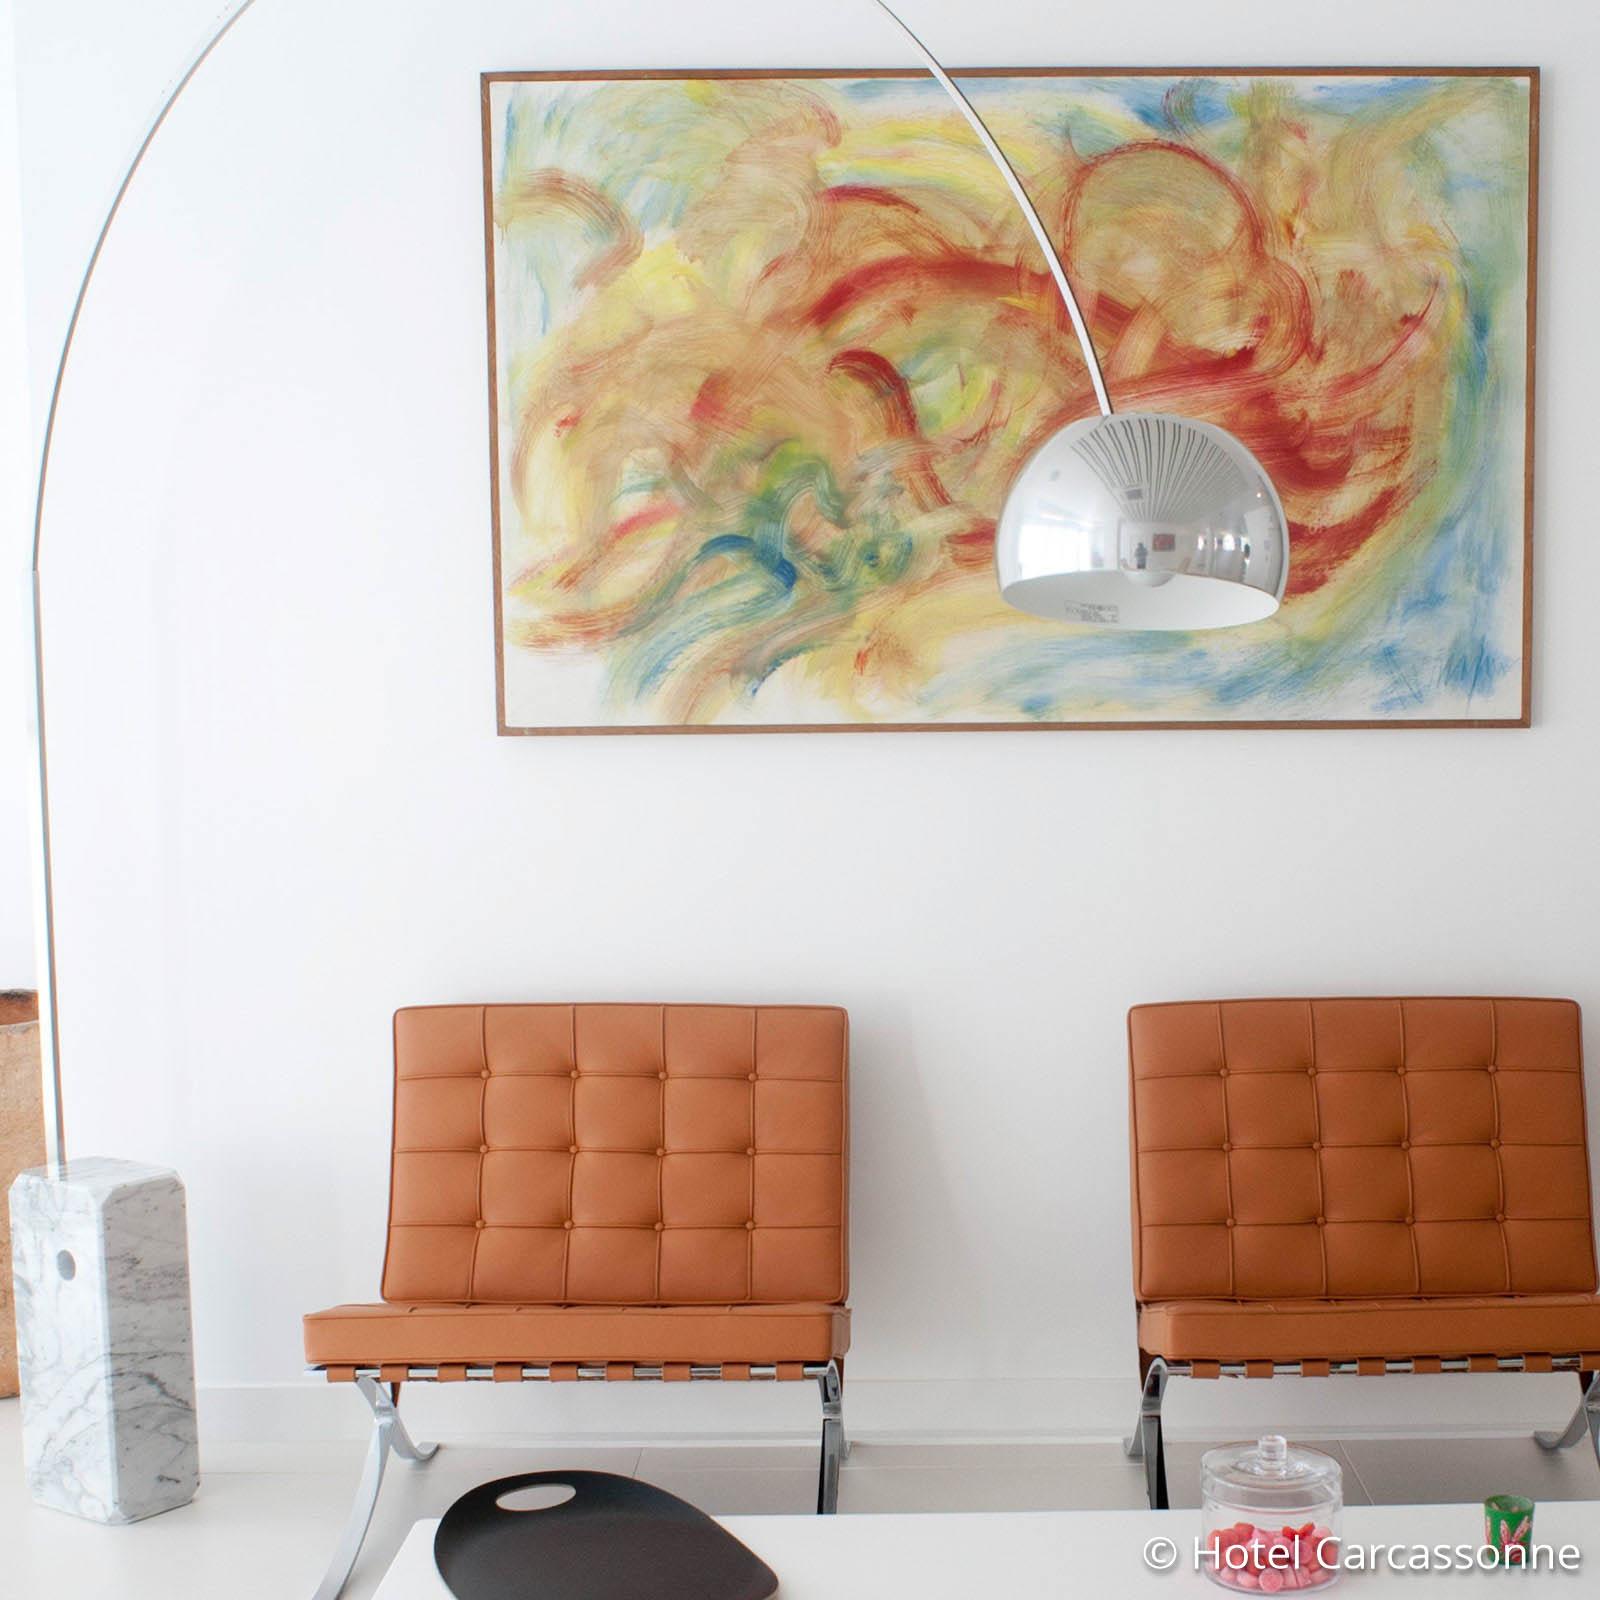 High-quality designer arc lamp Arco_3510002_1